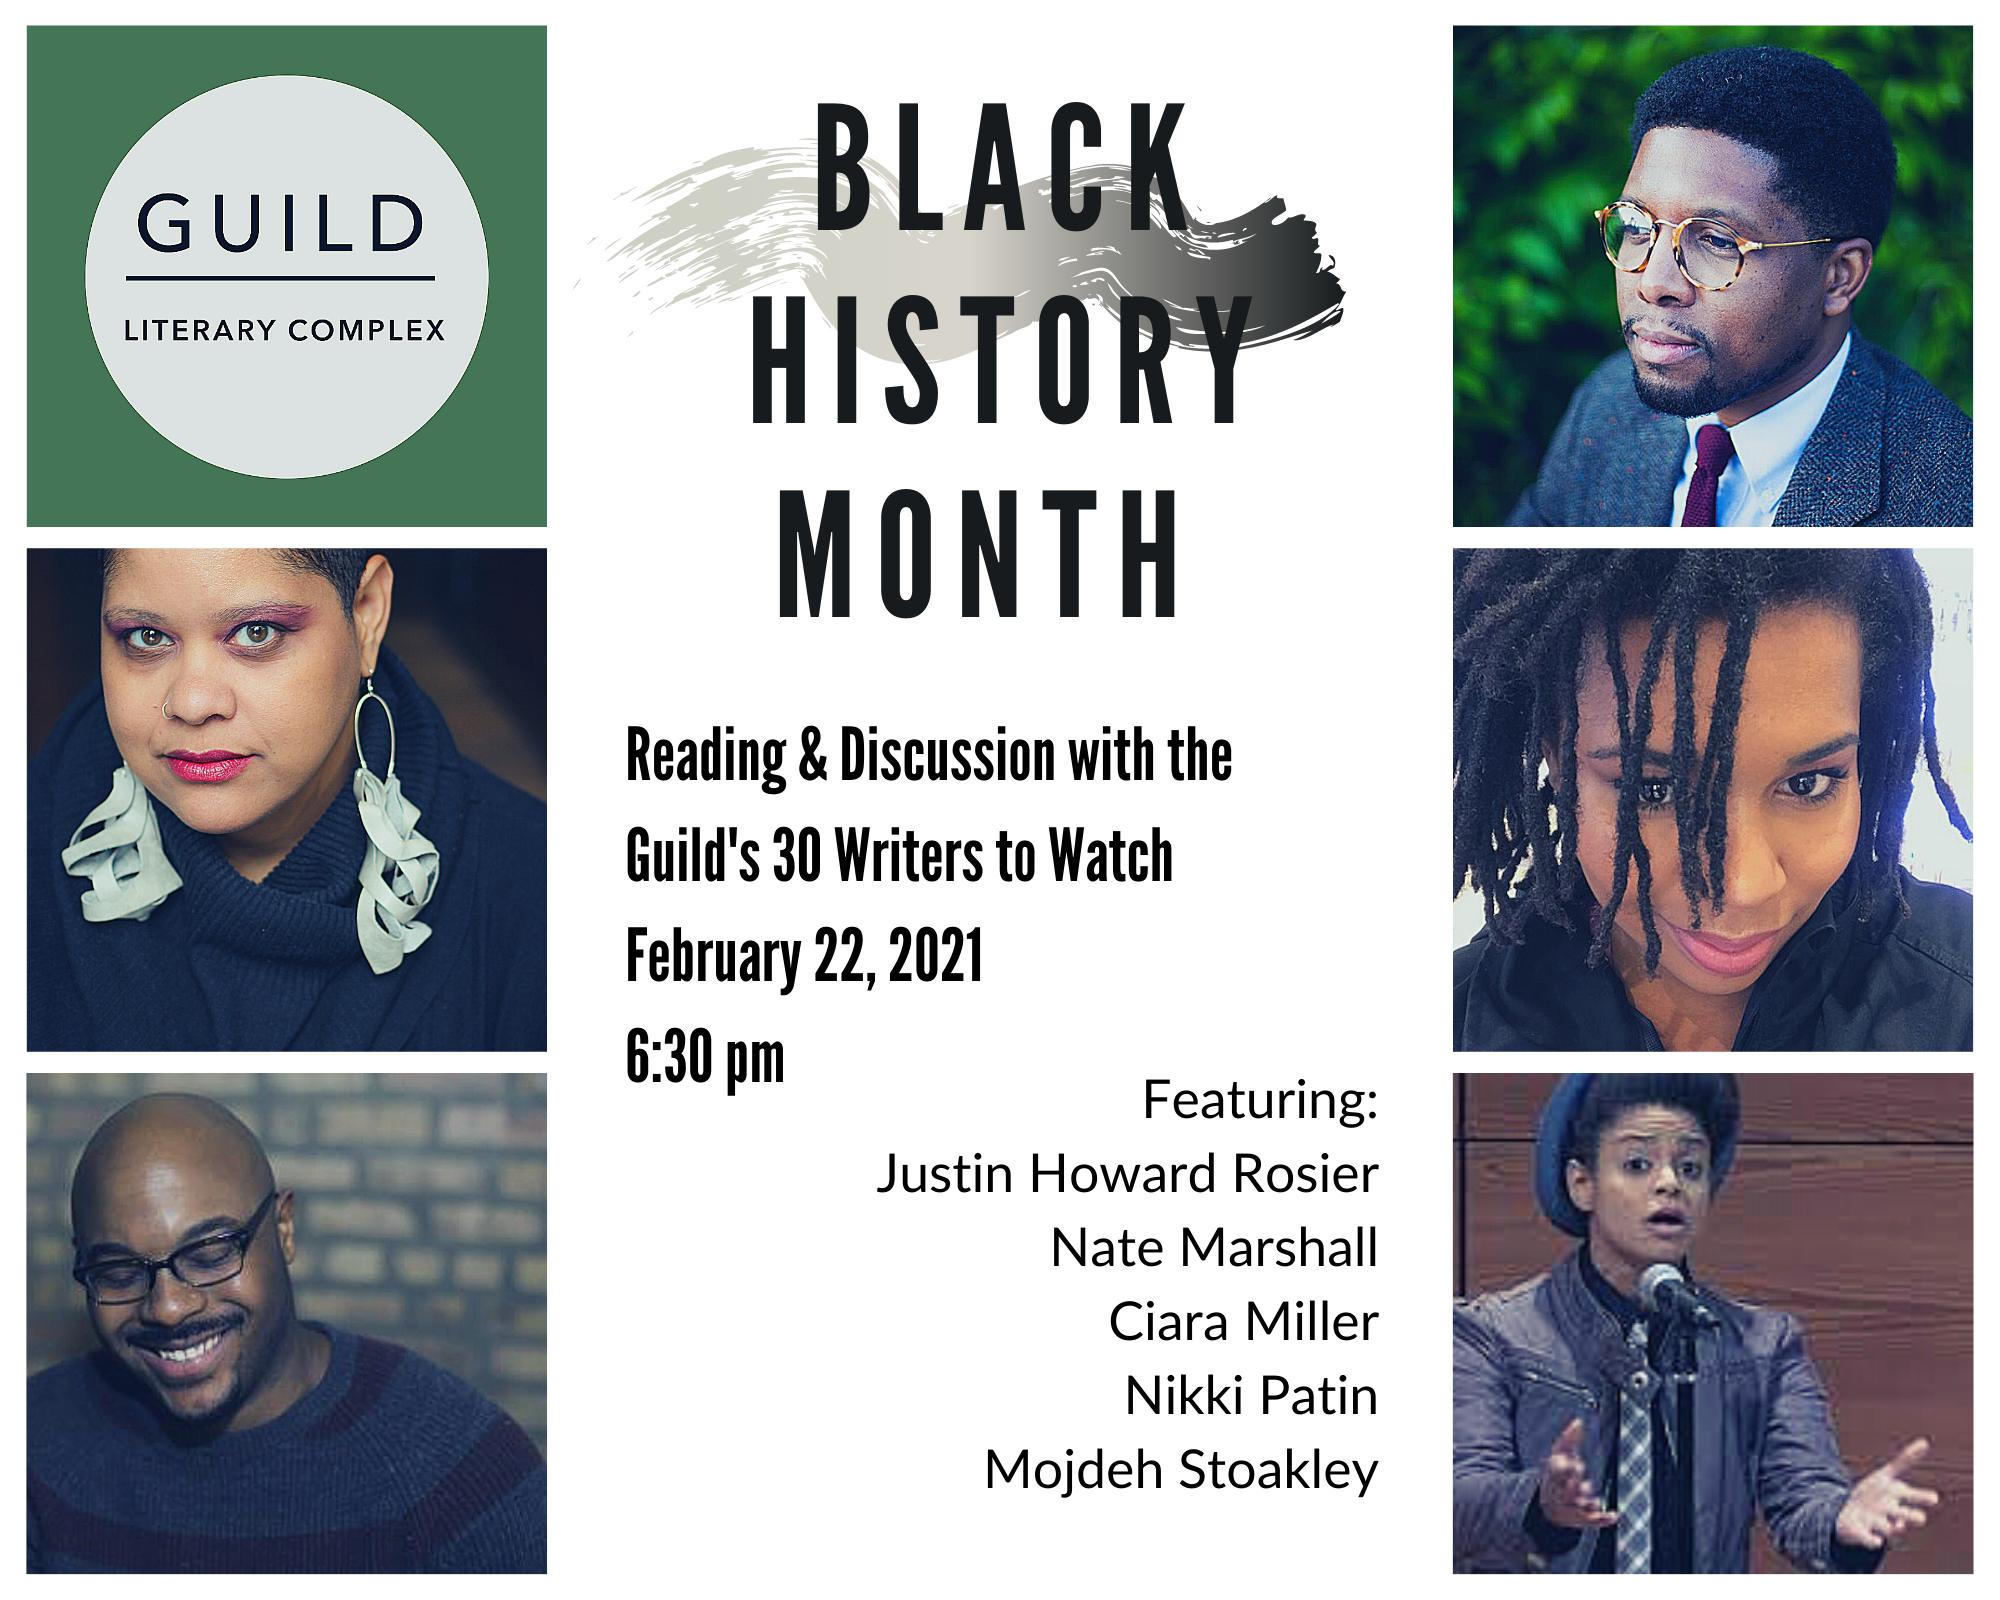 IMAGE: Six photos: The Guild logo + the authors TEXT: Black Historu Month